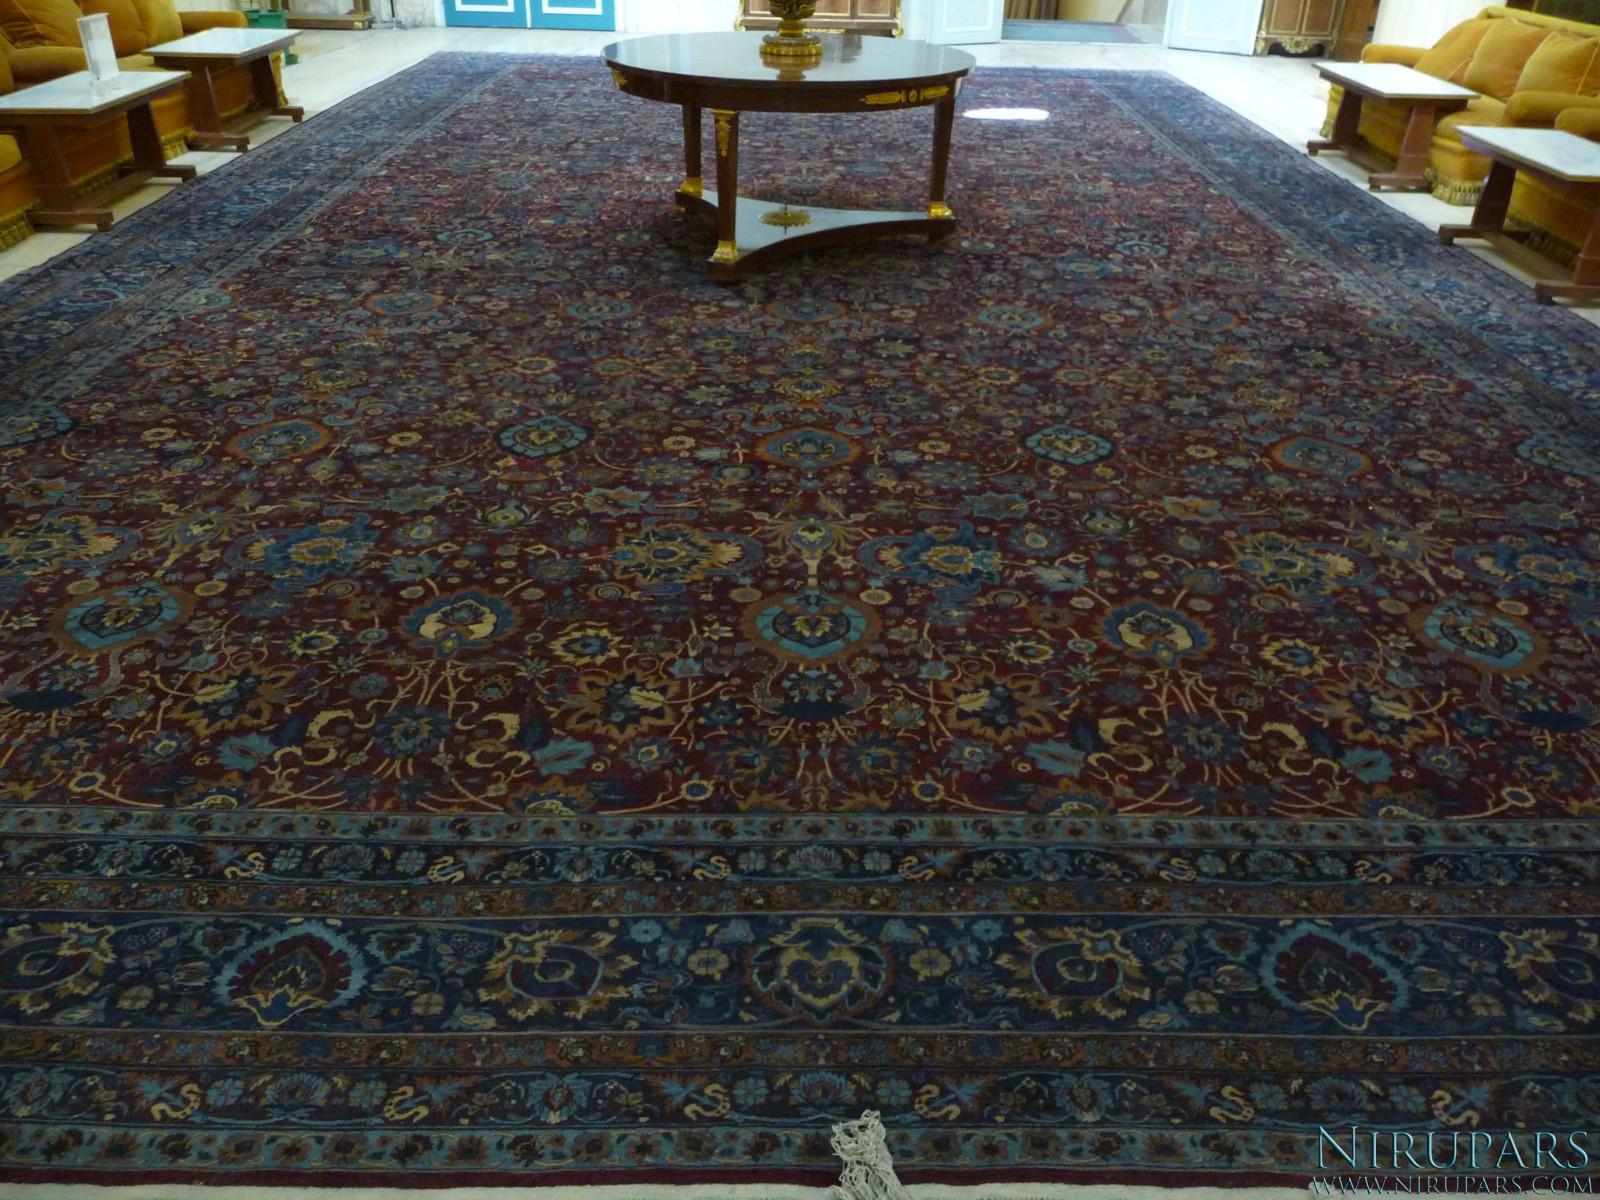 Sadabad Palace Complex - White Palace - Upper Floor - Persian Carpet